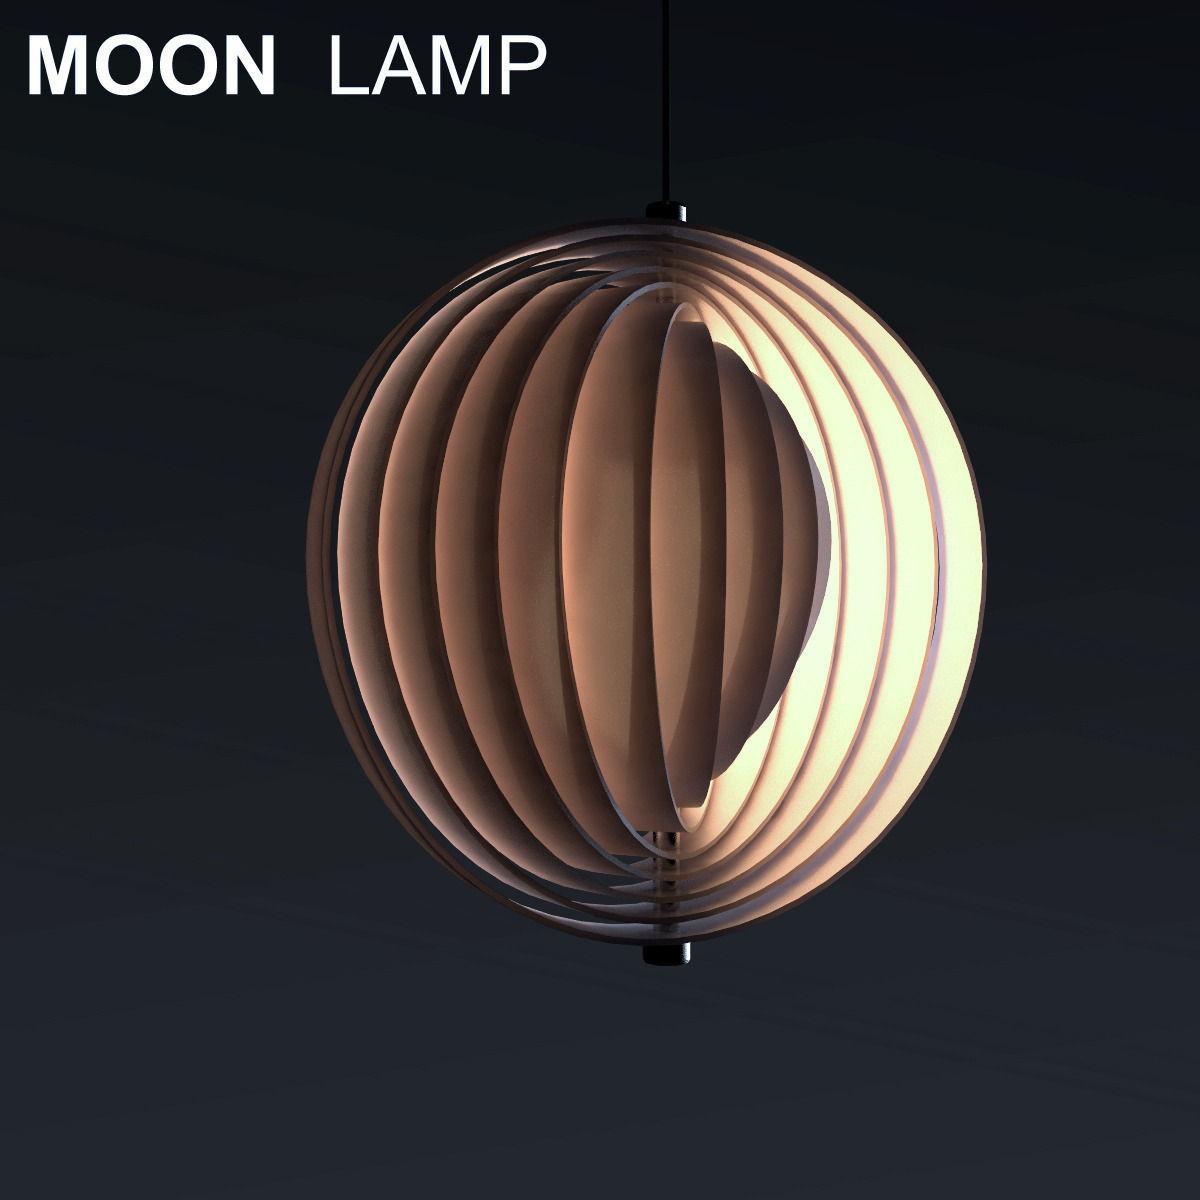 Panton lighting Pendant Moon Lamp By Verner Panton 3d Model Max Obj Mtl Fbx Vntg Moon Lamp By Verner Panton 3d Cgtrader